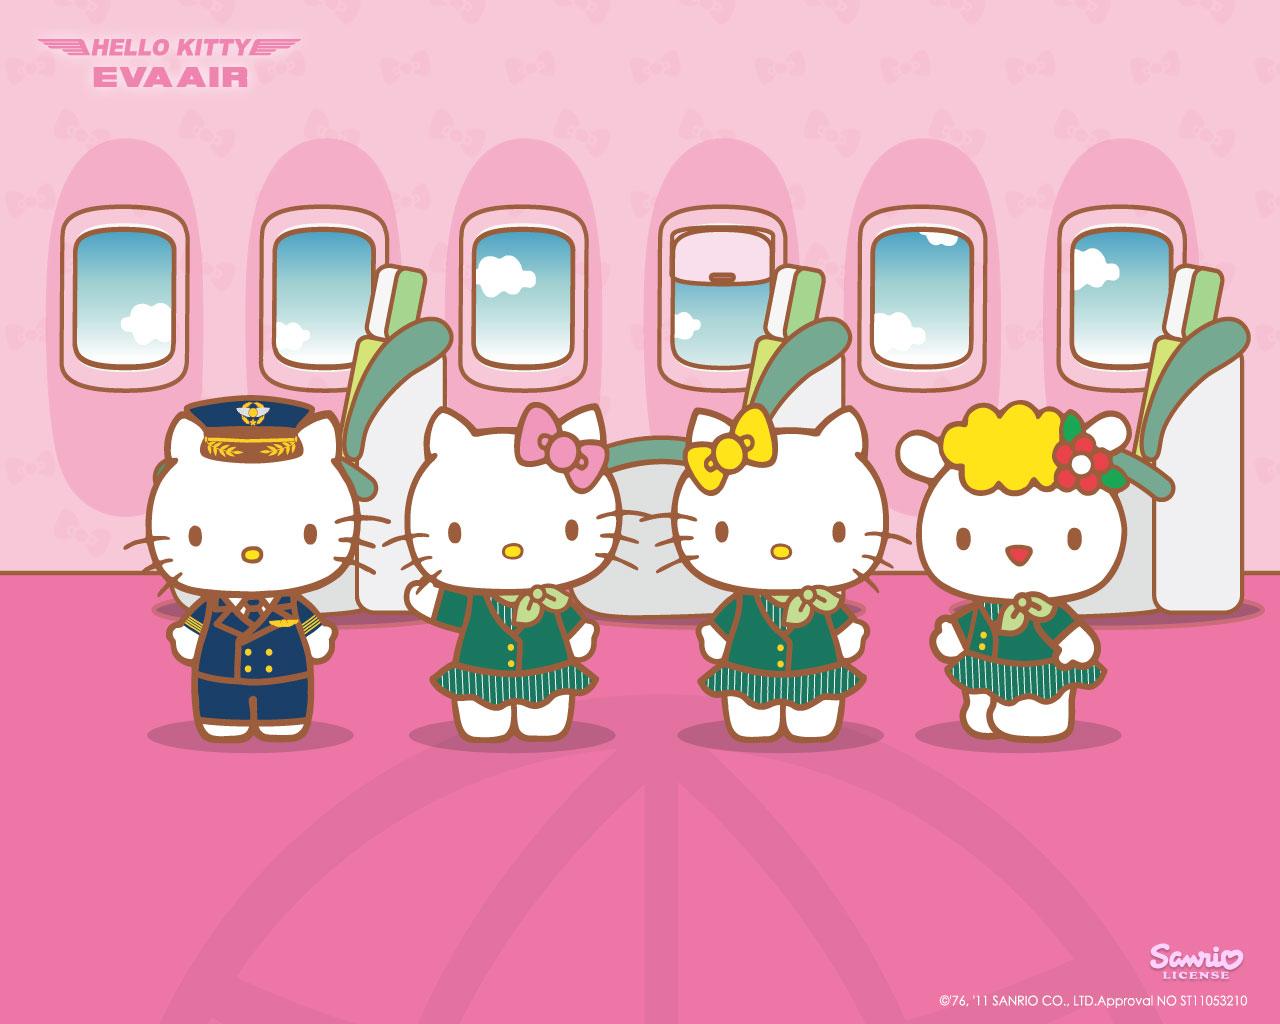 Great Wallpaper Hello Kitty Calendar - hellokitty_wallpaper_v2  Photograph_633391.jpg